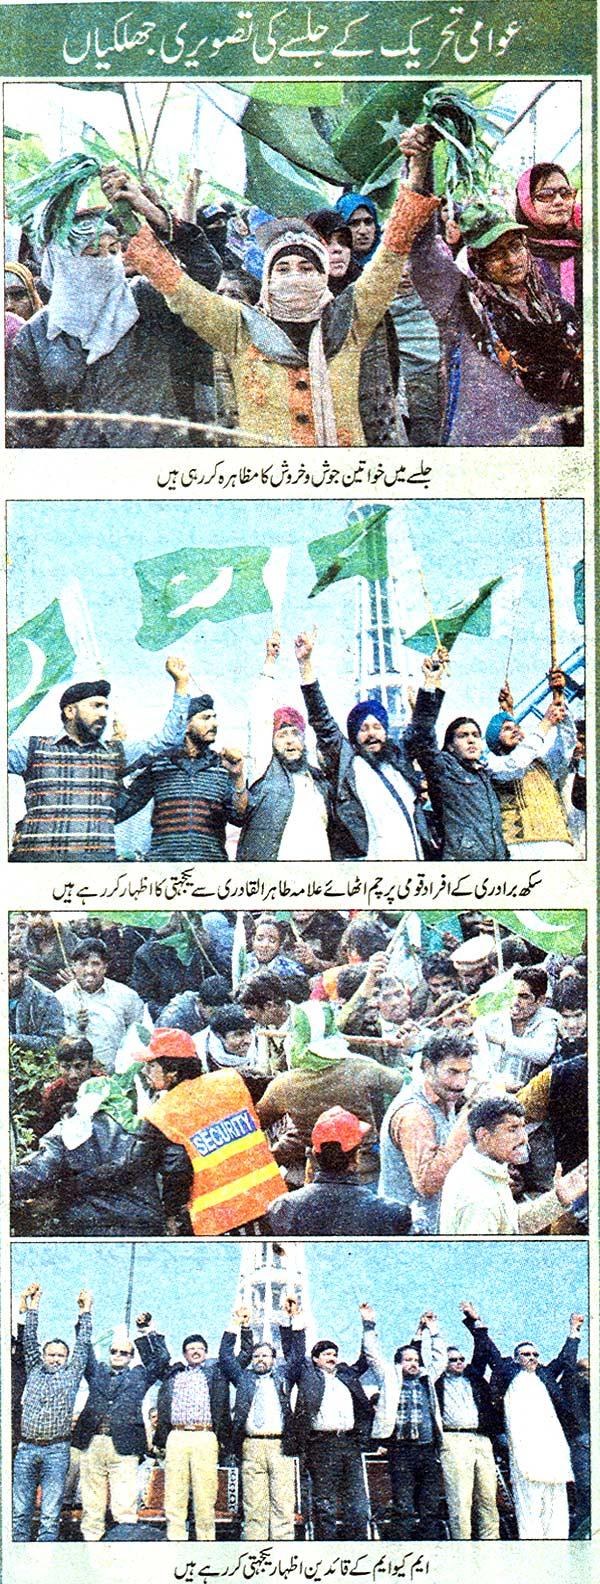 تحریک منہاج القرآن Minhaj-ul-Quran  Print Media Coverage پرنٹ میڈیا کوریج Daily Waqt